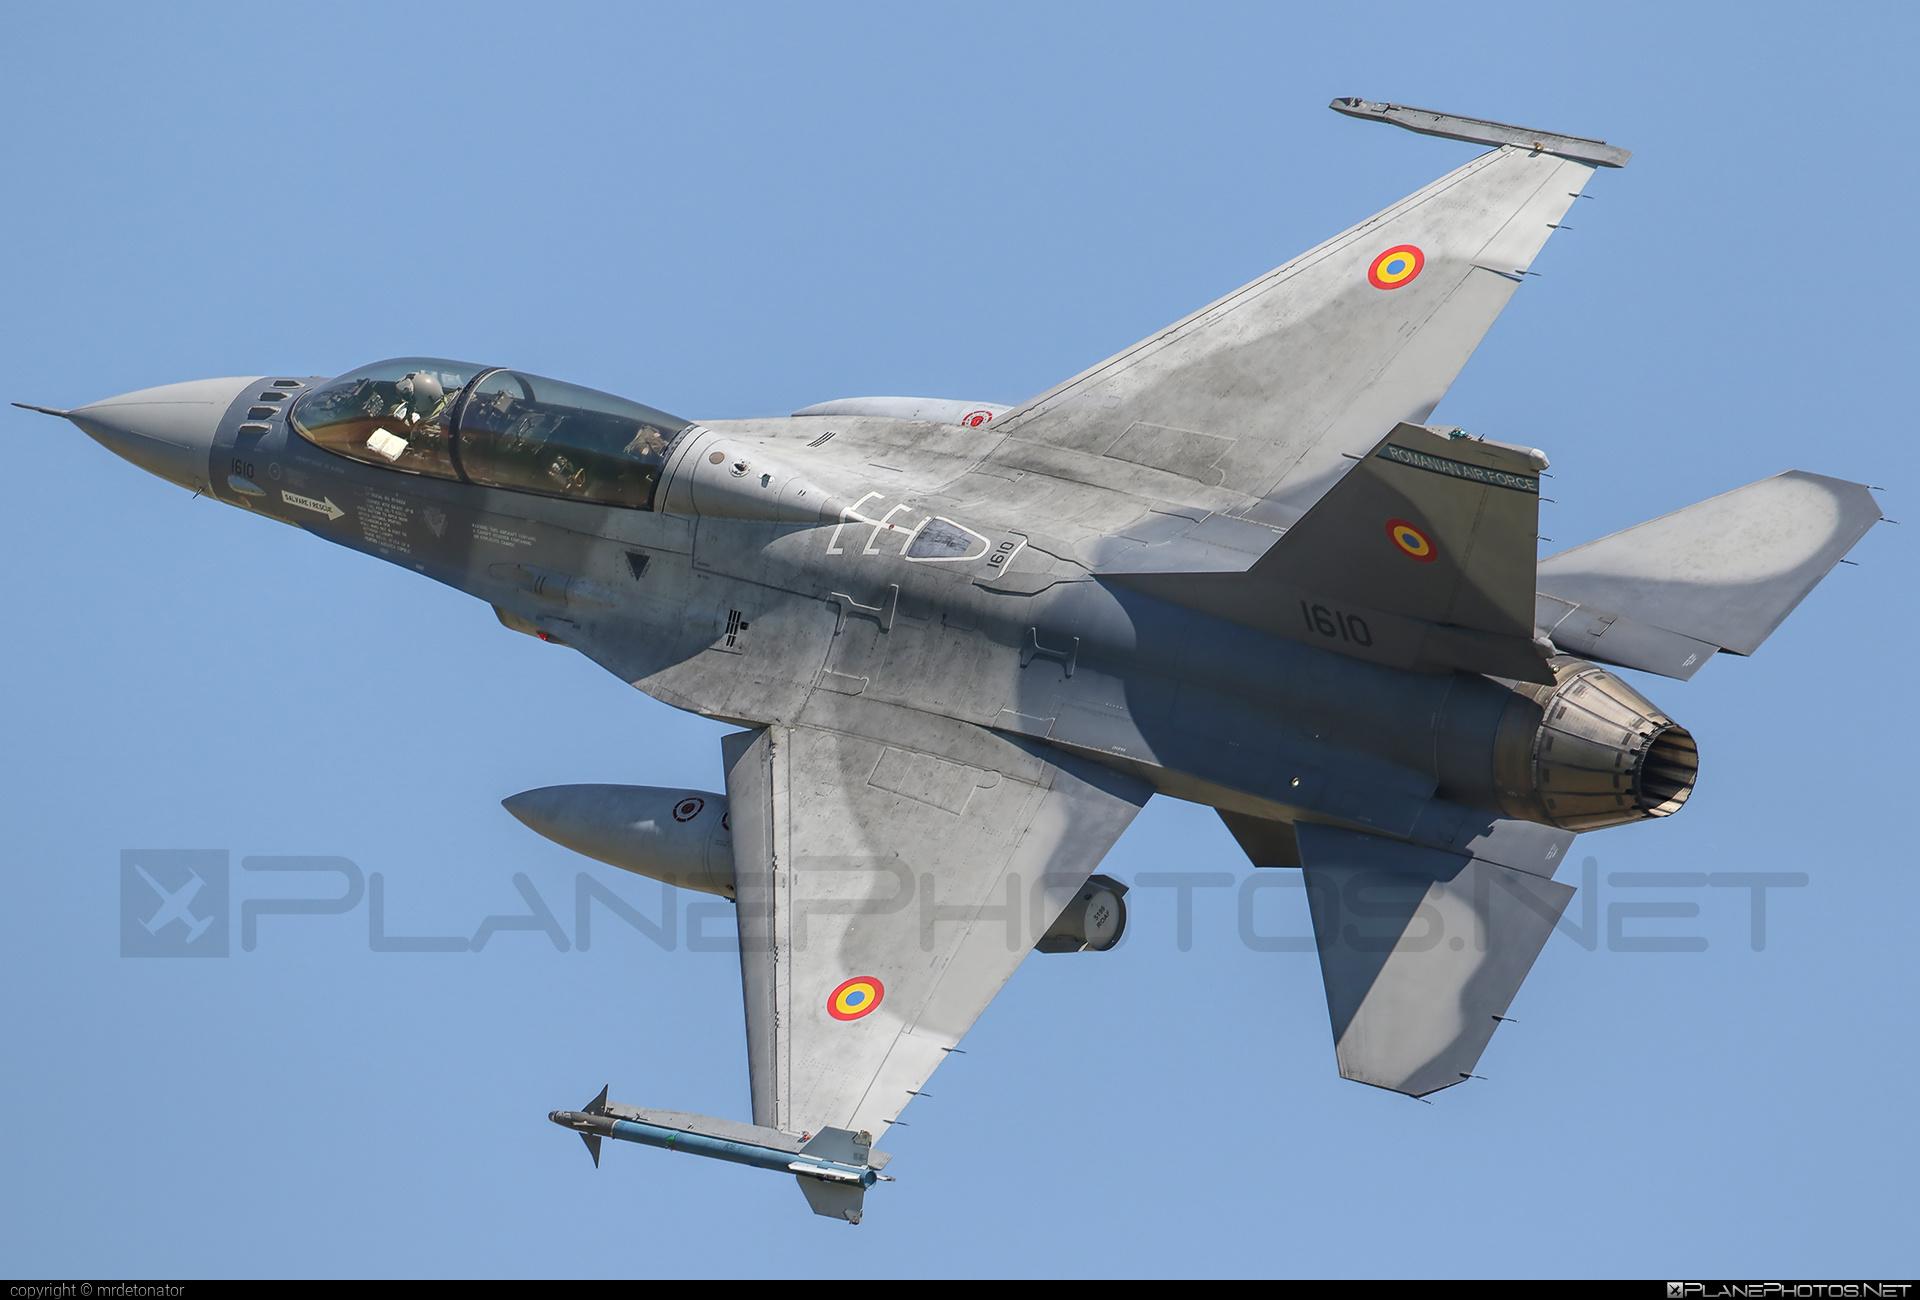 General Dynamics F-16BM Fighting Falcon - 1610 operated by Forţele Aeriene Române (Romanian Air Force) #f16 #f16bm #fightingfalcon #forteleaerieneromane #generaldynamics #romanianairforce